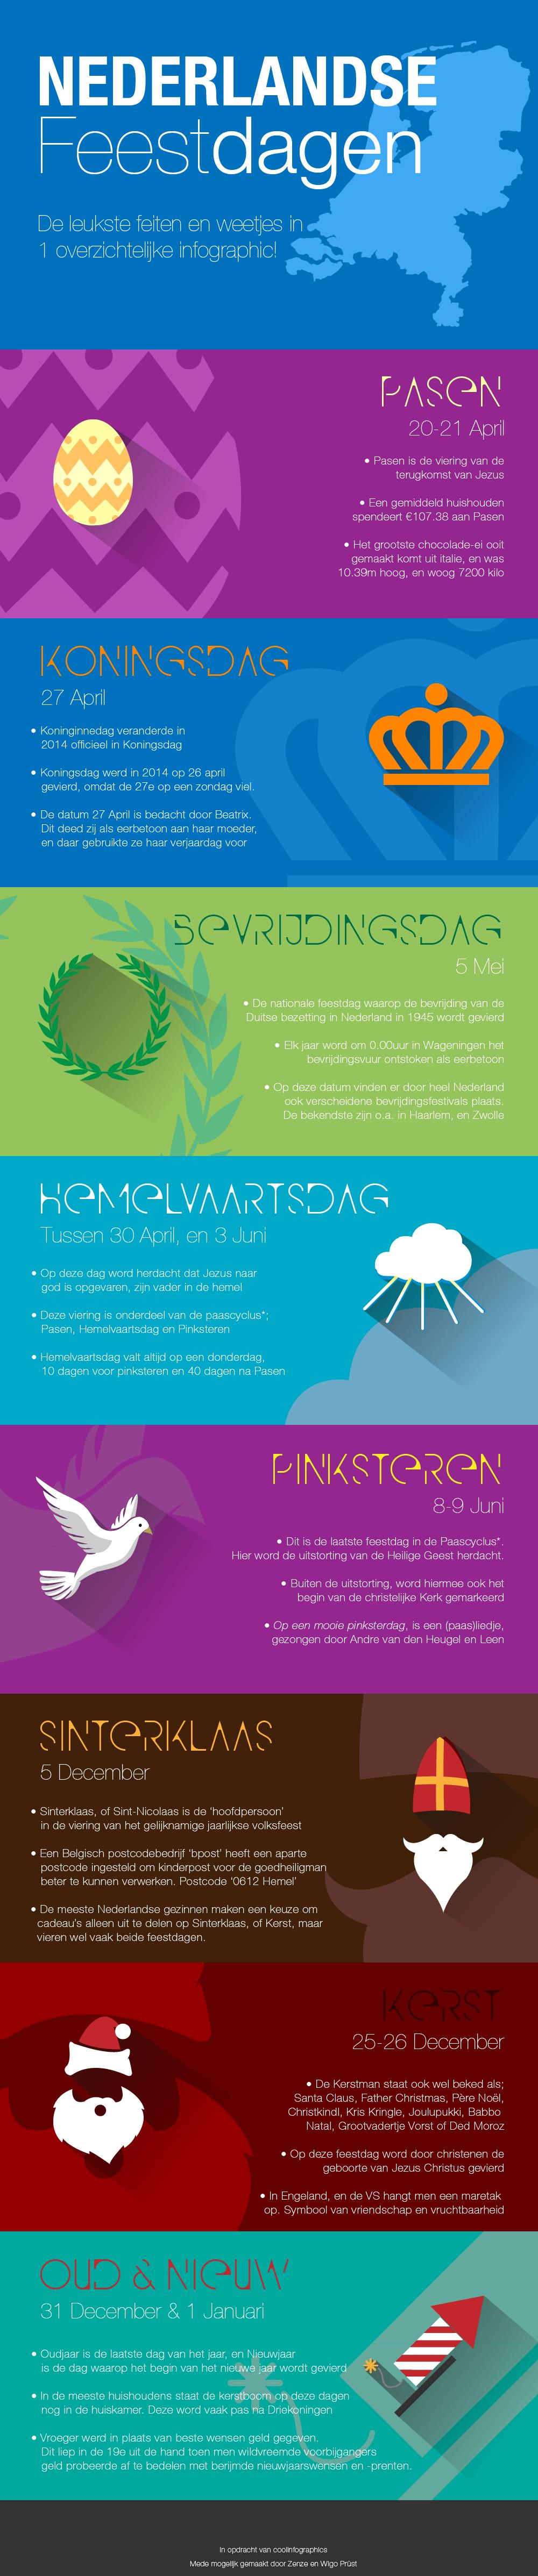 Nederlandse feestdagen de leukste feitjes